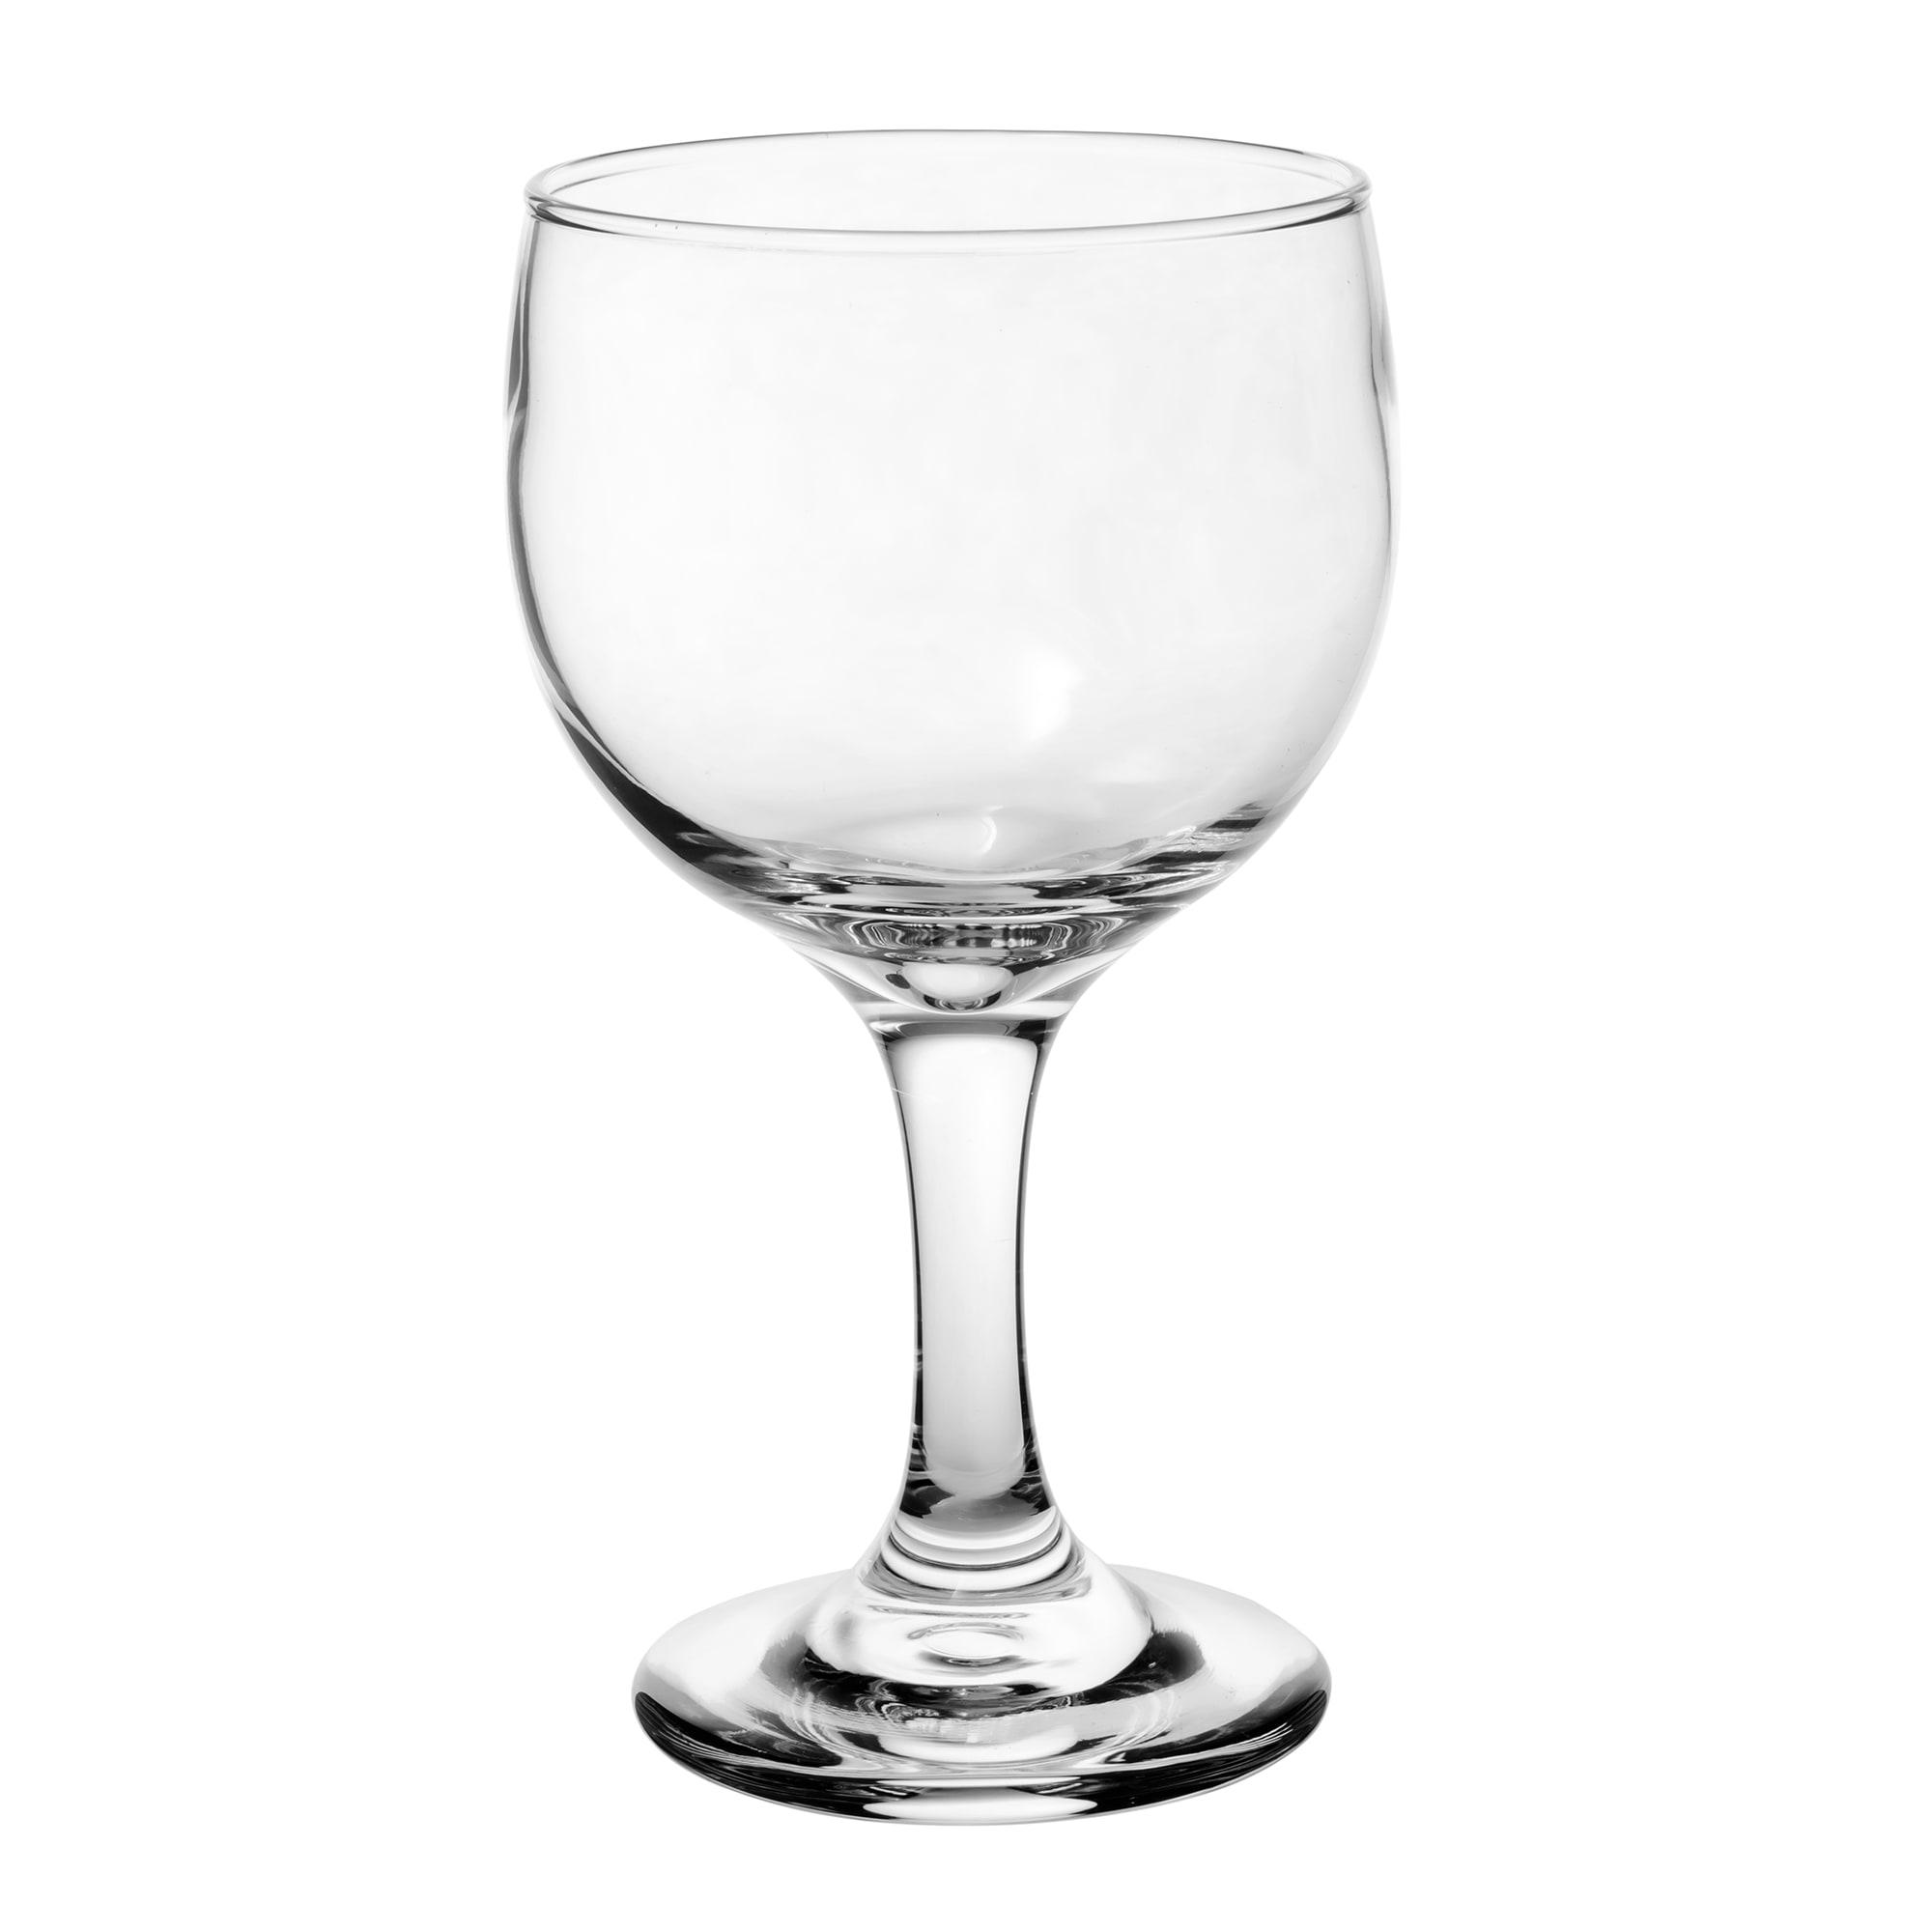 Libbey 3757 10.5 oz Embassy Wine Glass - Safedge Rim & Foot Guarantee